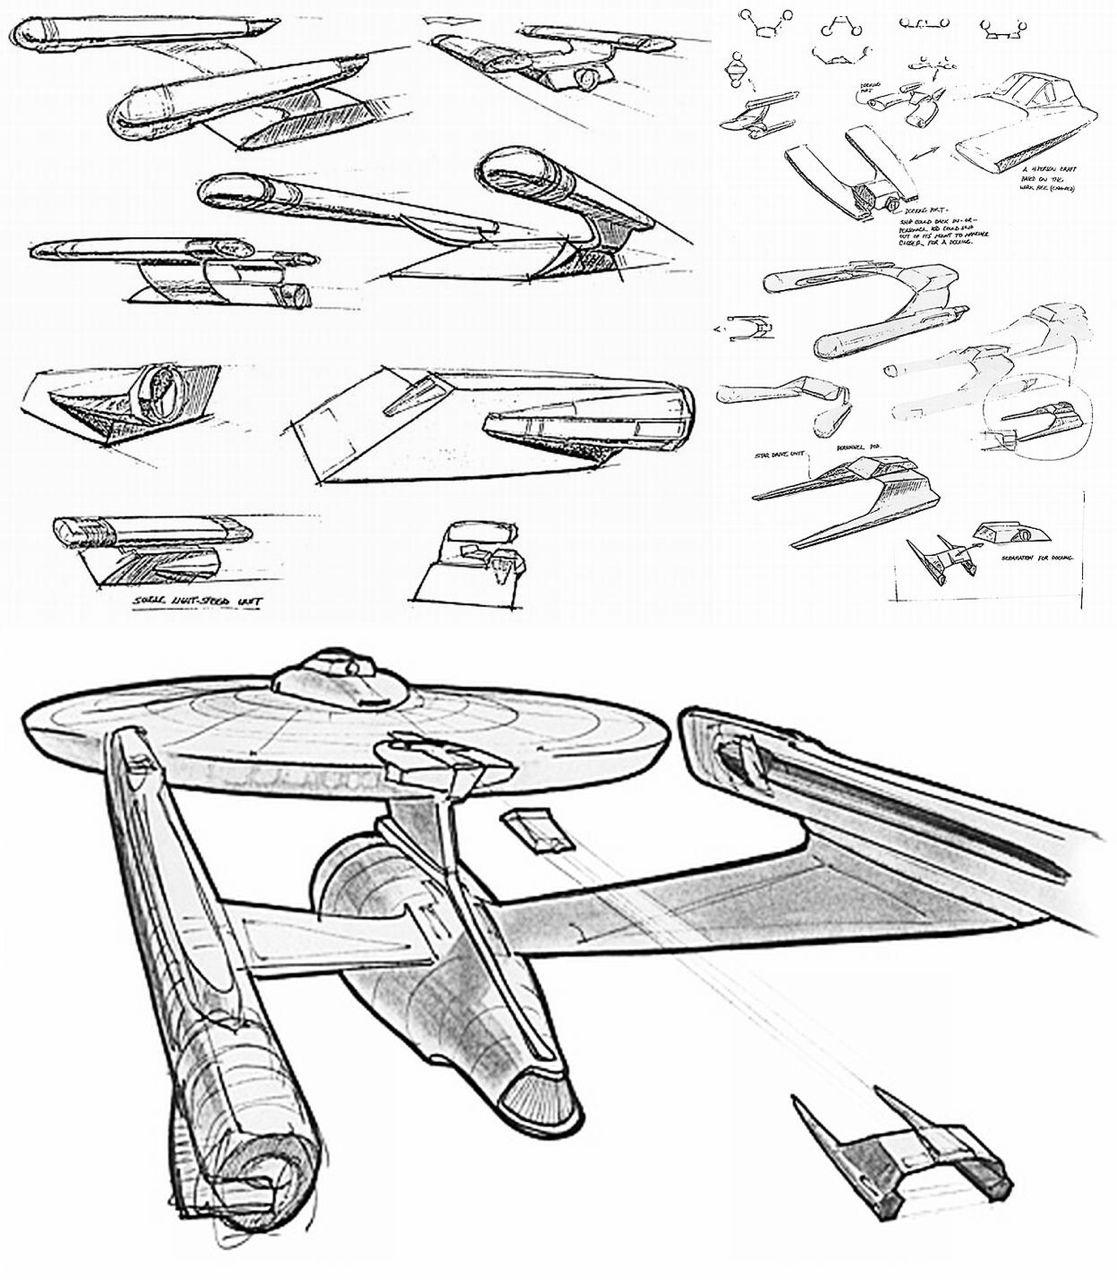 U S S Enterprise Concept Art And Design By Andrew Probert